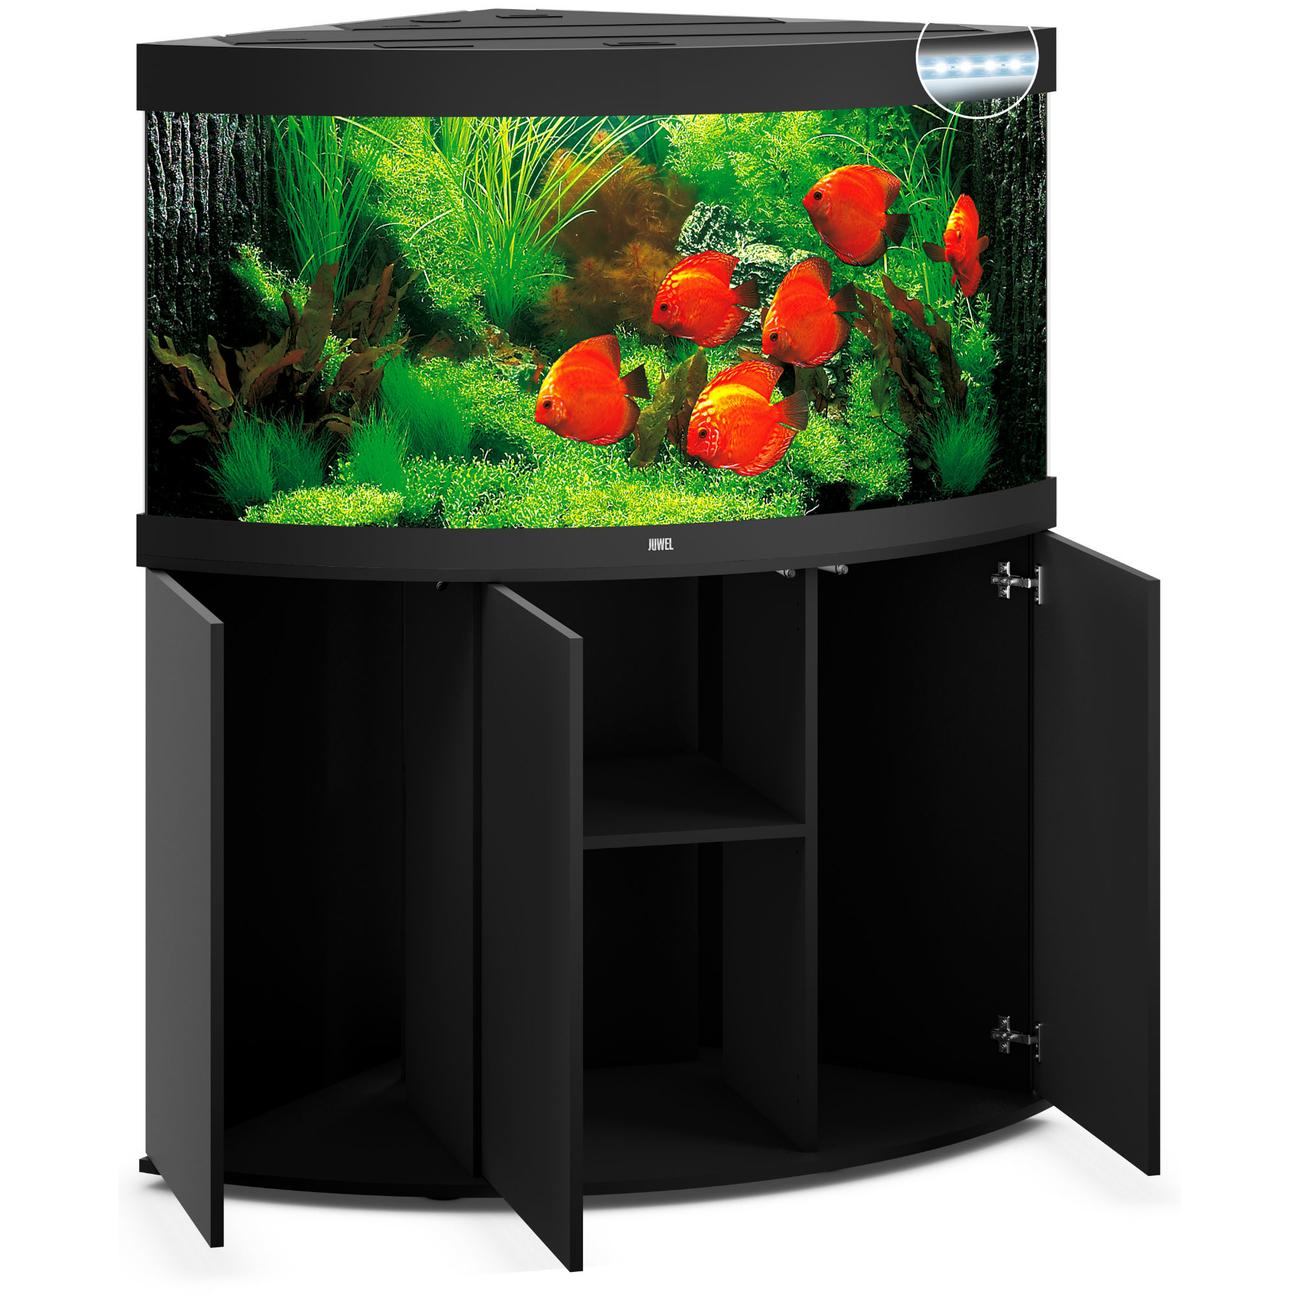 Juwel Trigon 350 LED Eck-Aquarium mit Unterschrank, Bild 3